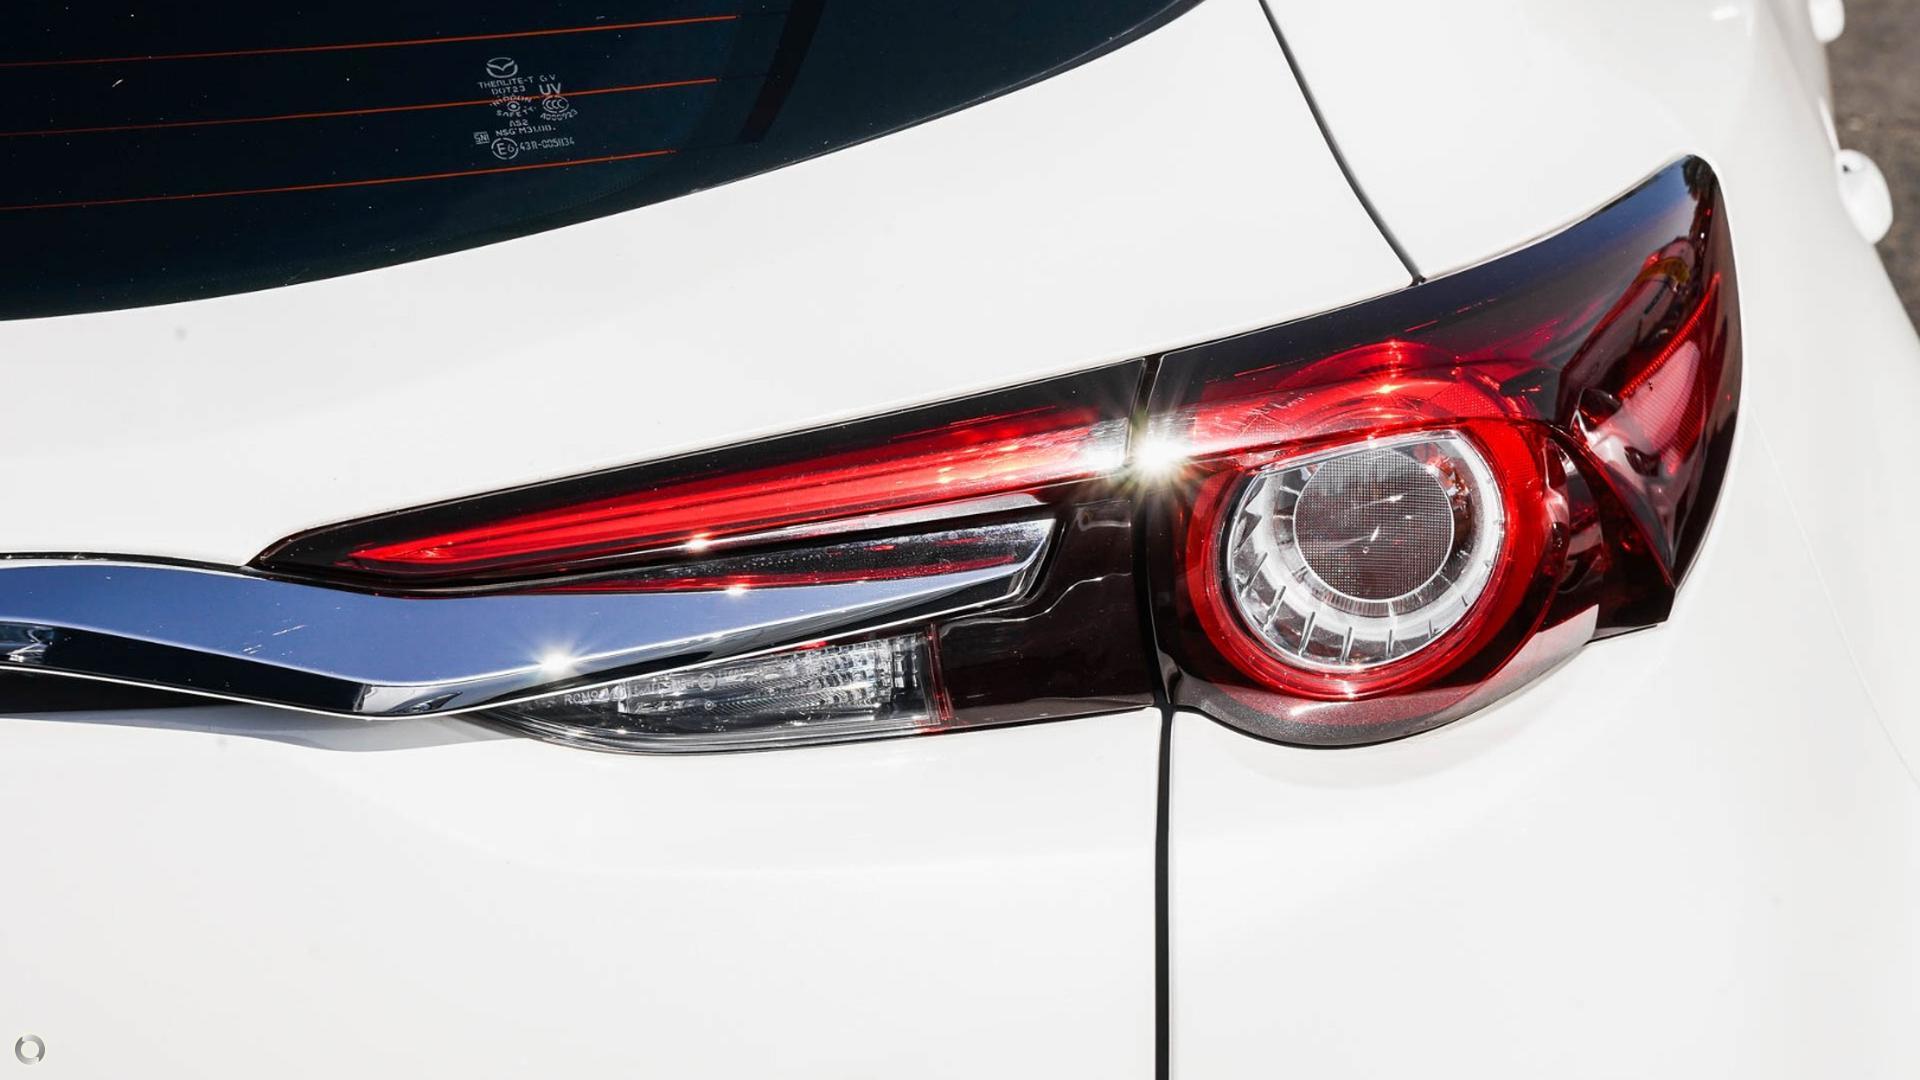 2017 Mazda Cx-9 Touring TC